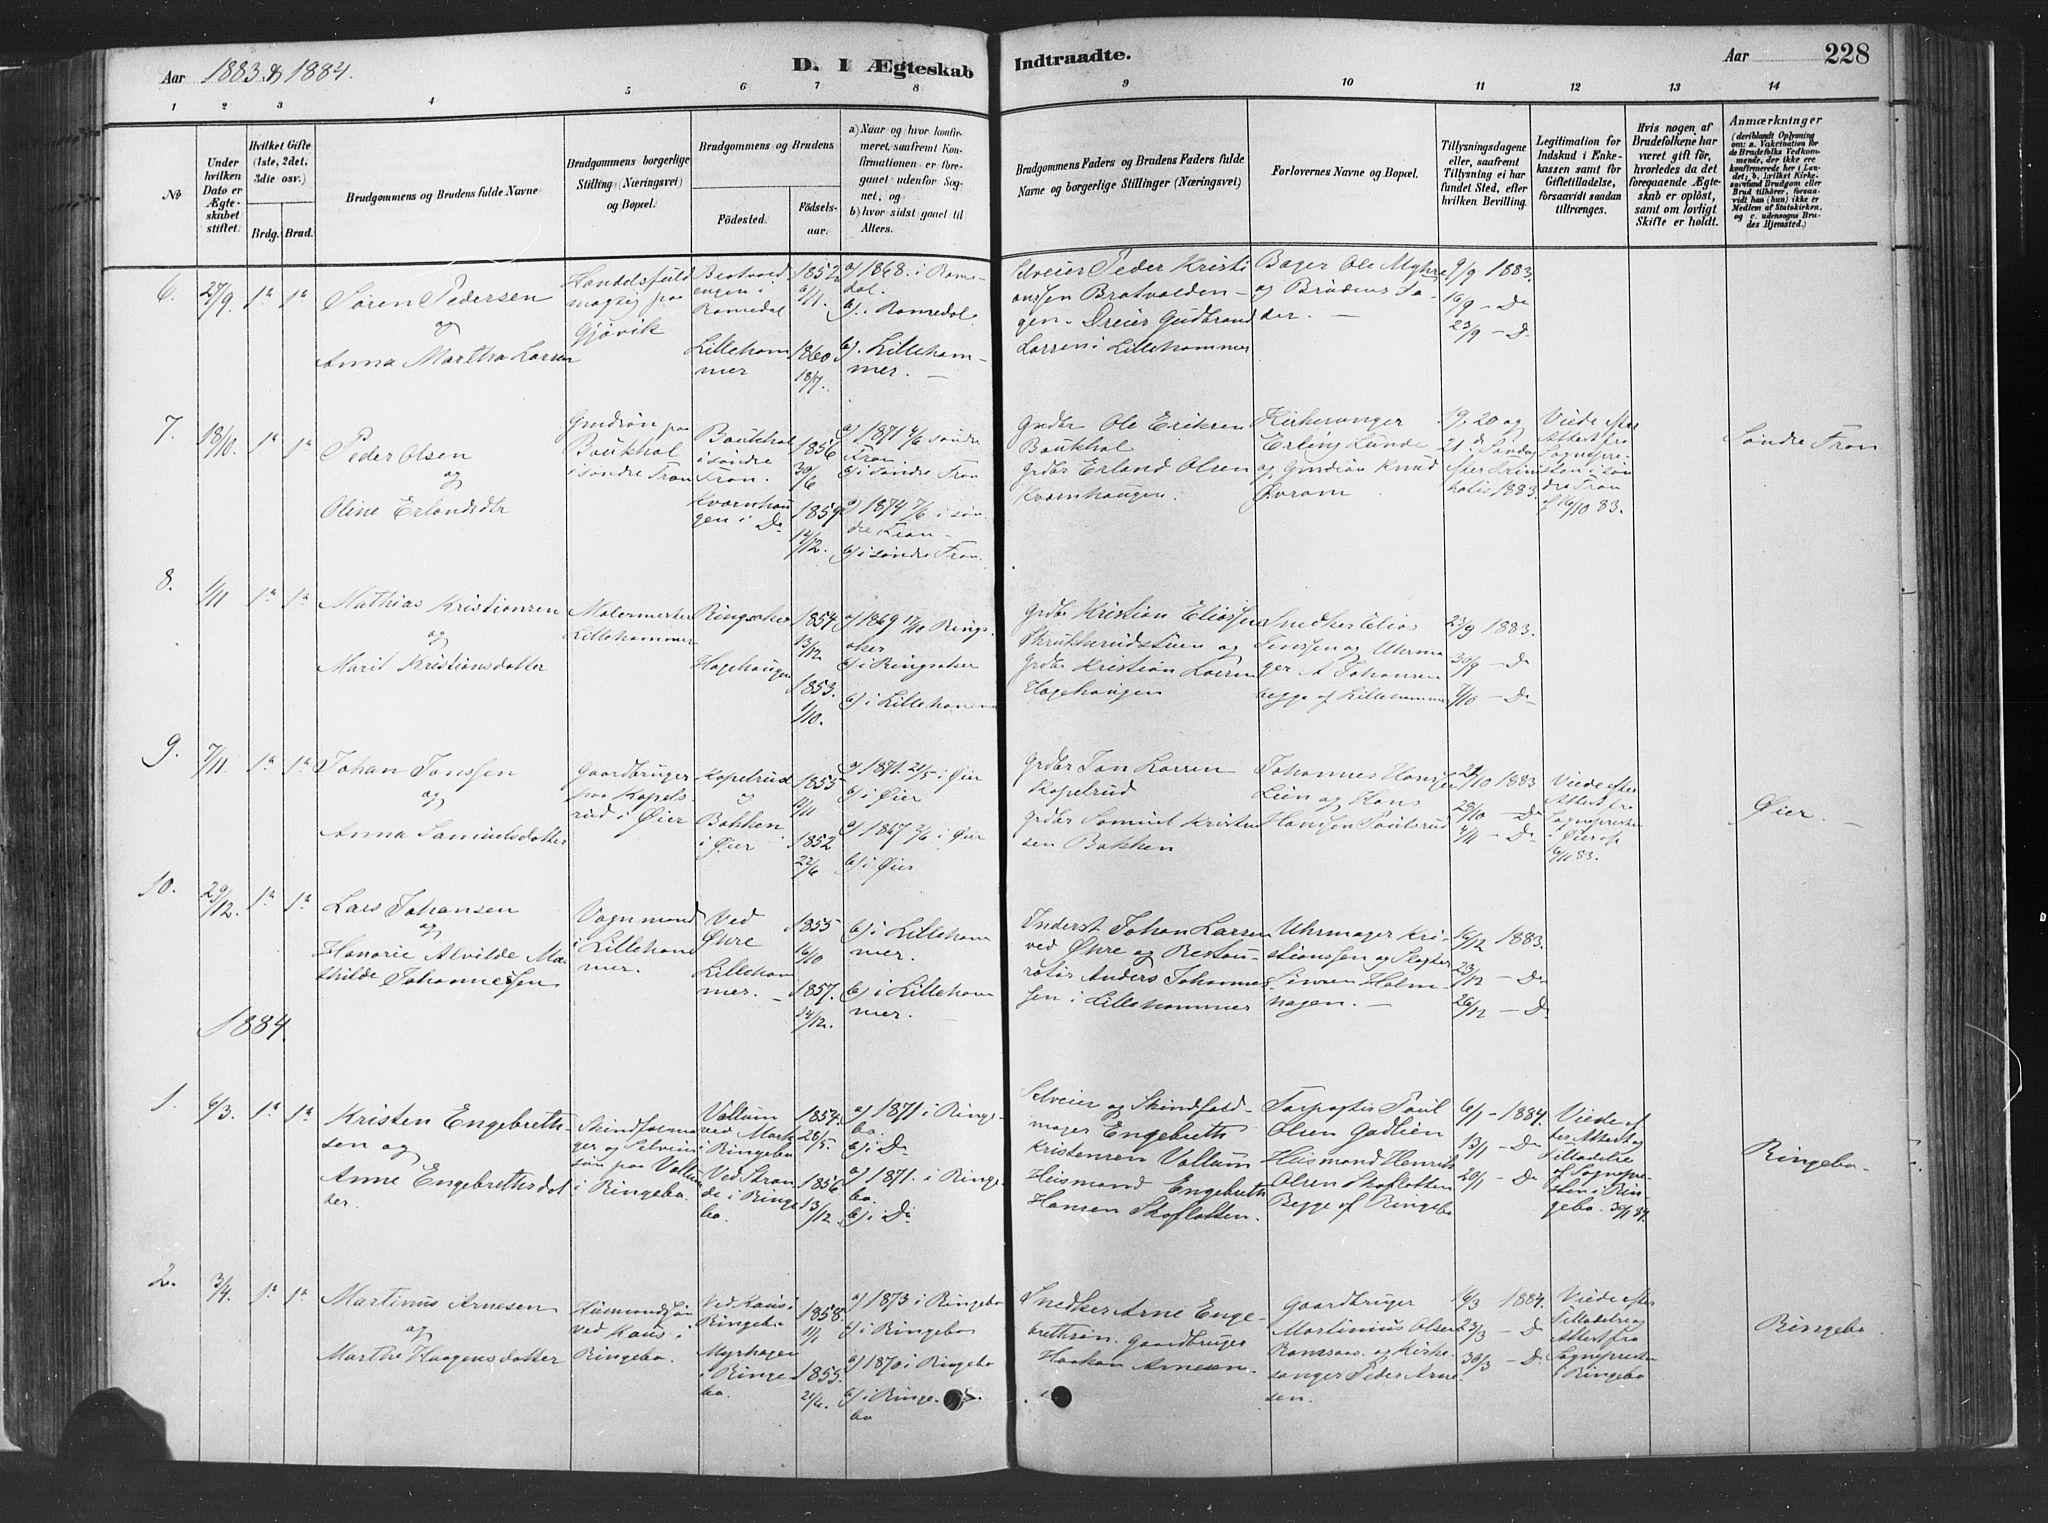 SAH, Fåberg prestekontor, H/Ha/Haa/L0010: Parish register (official) no. 10, 1879-1900, p. 228